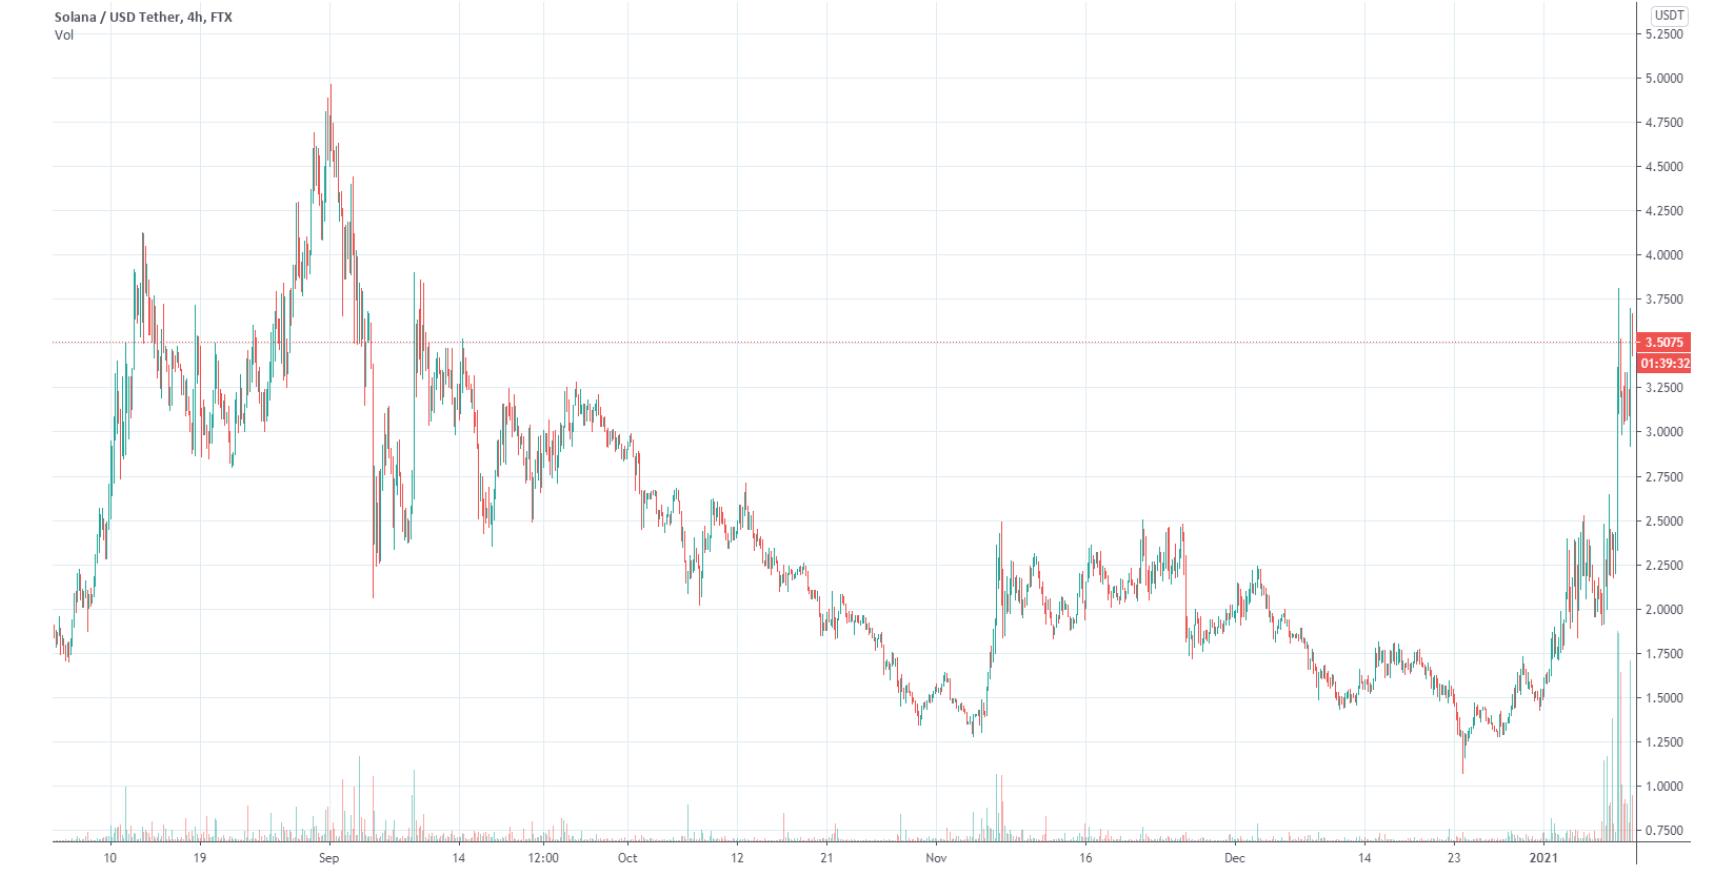 Solana (SOL) trading volume soars as DeFi investors seek ETH alternatives